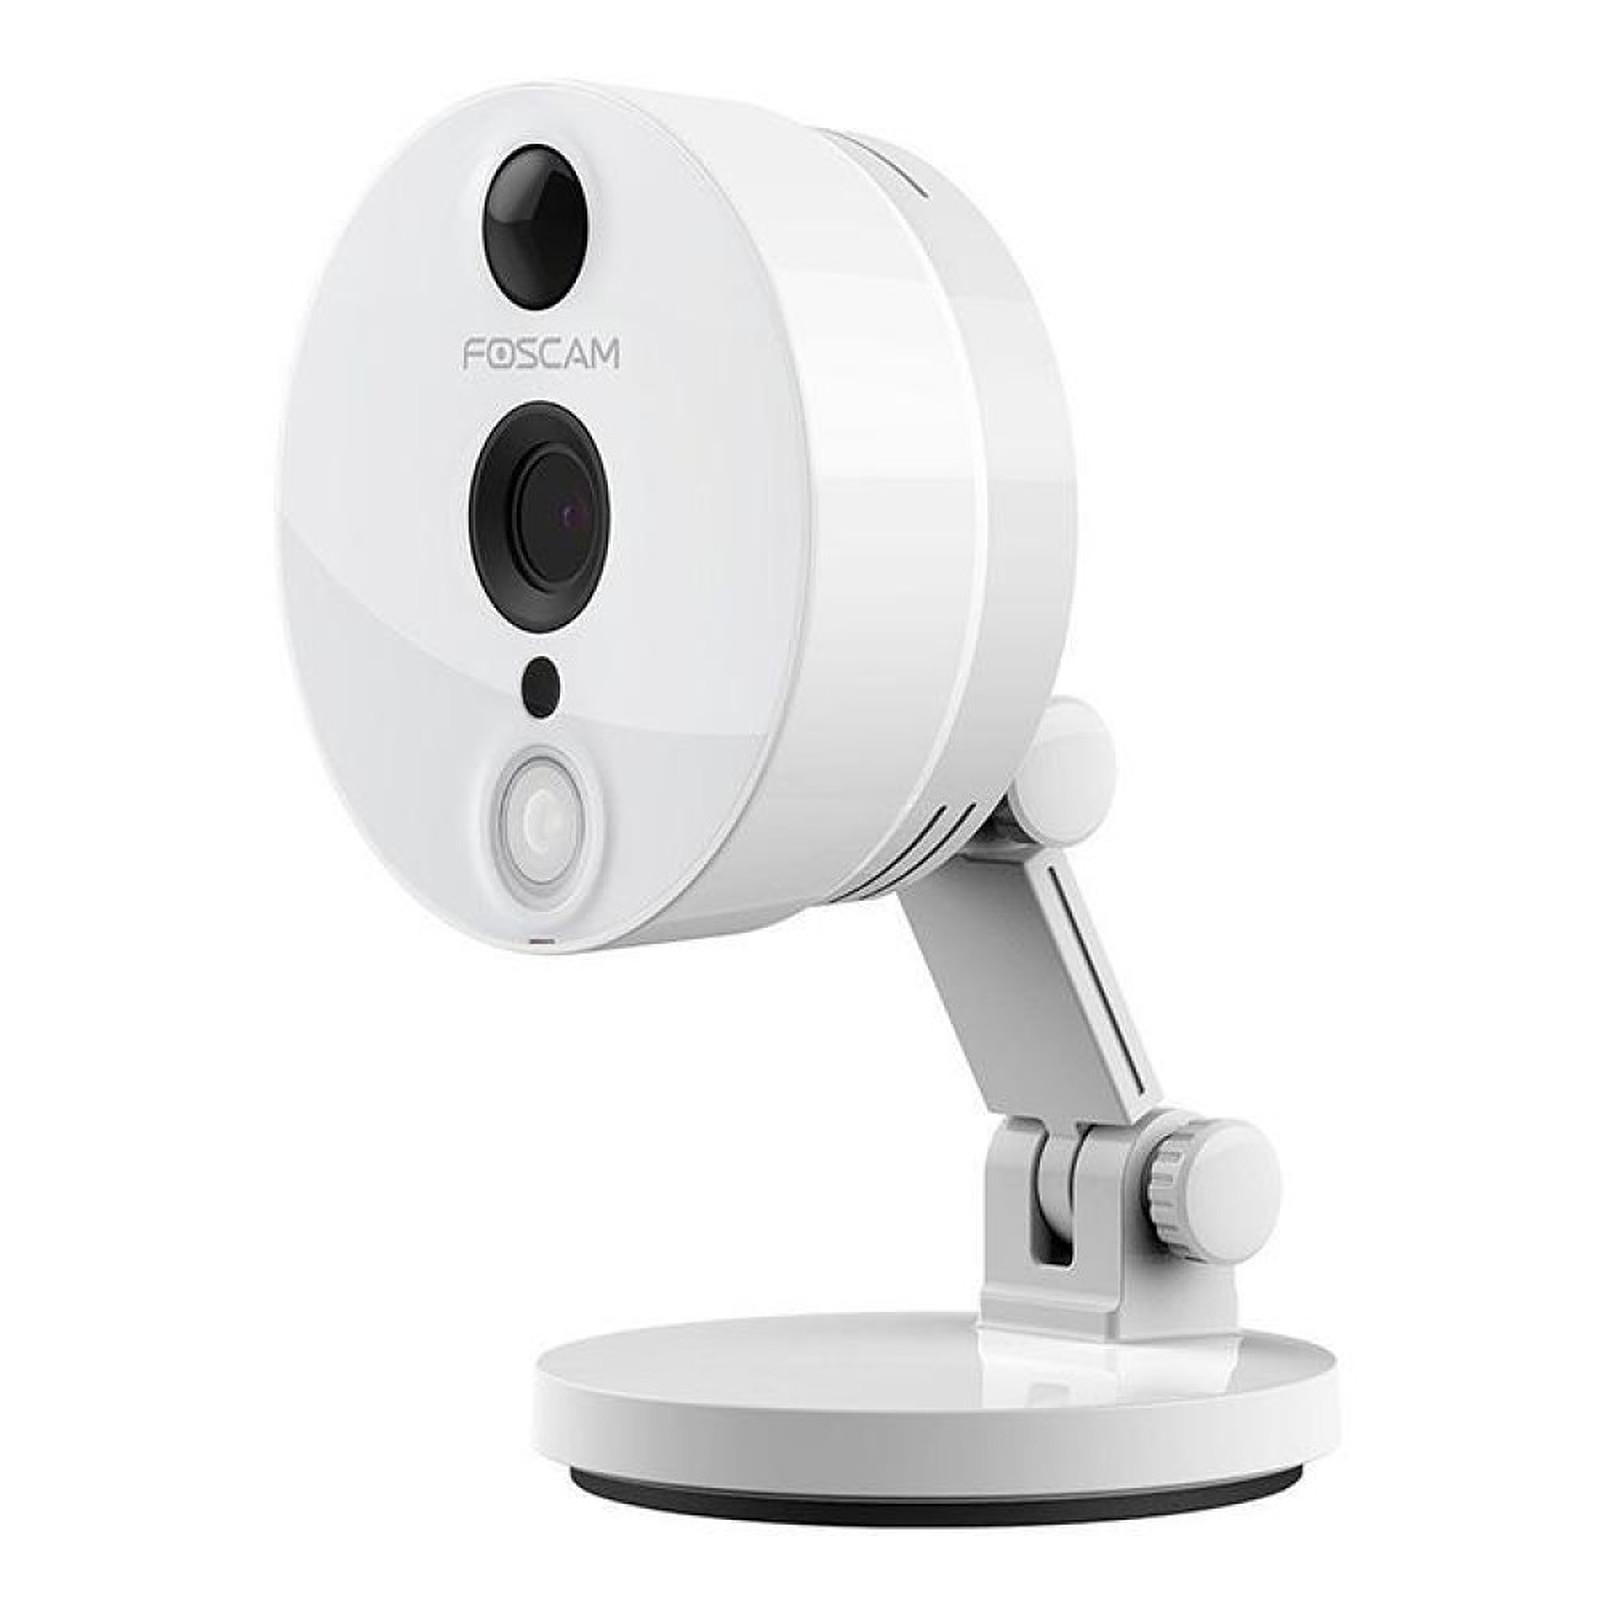 Foscam Caméra Intérieure Ip C2 Wifi Fullhd Blanche FOS_FIC2WHITE